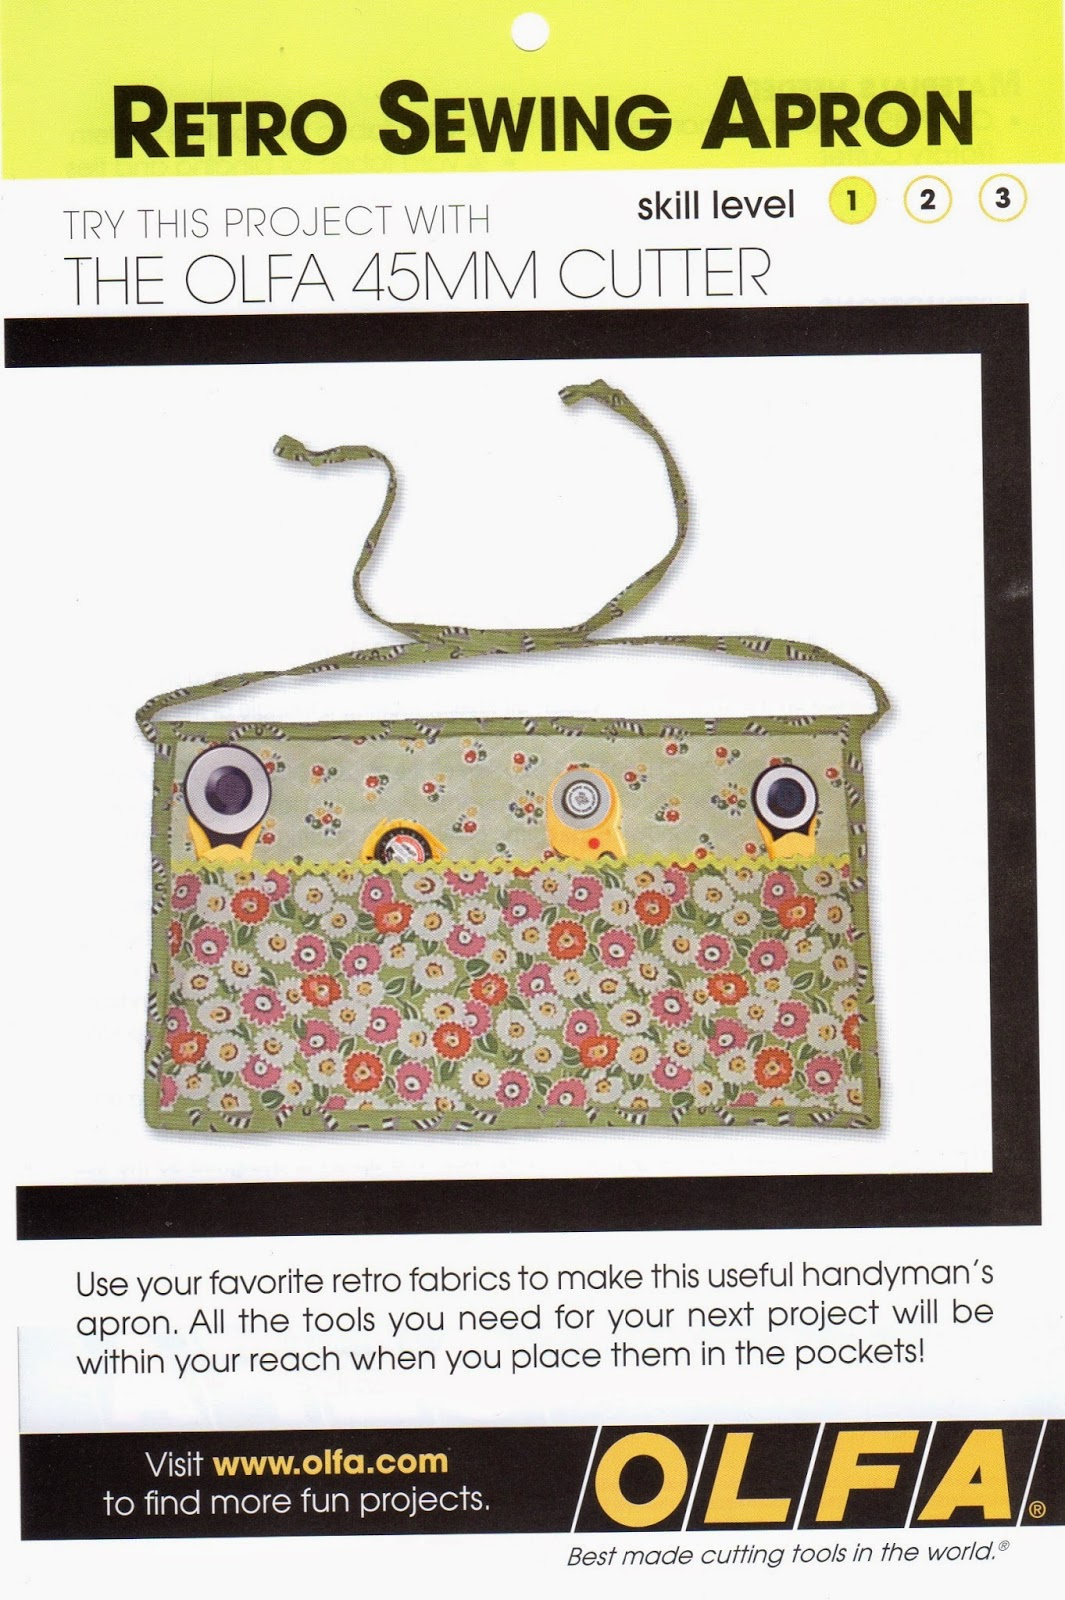 rotary cutter apron, Olfa